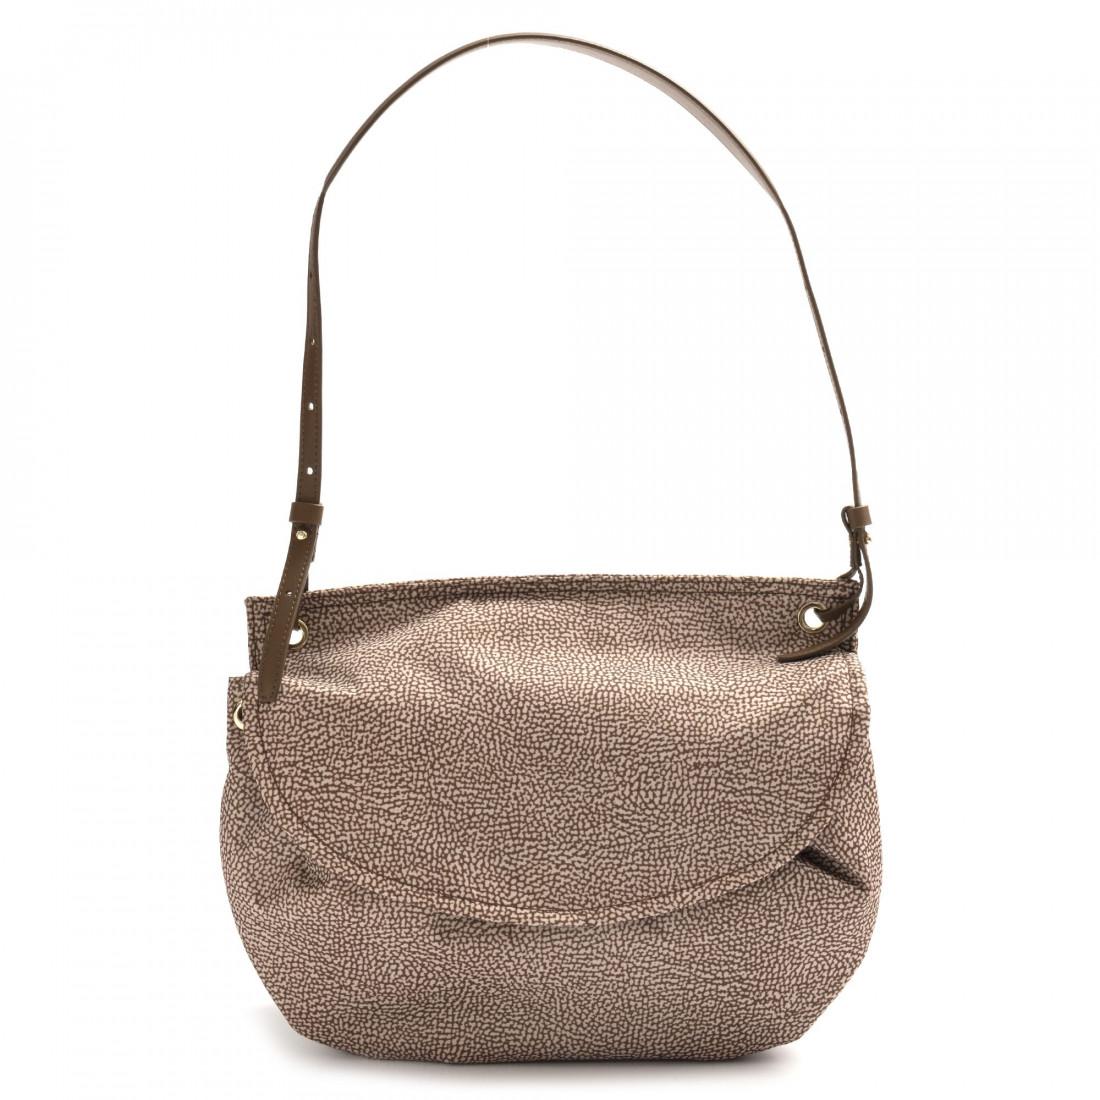 handbags woman borbonese 933369i15994 8477